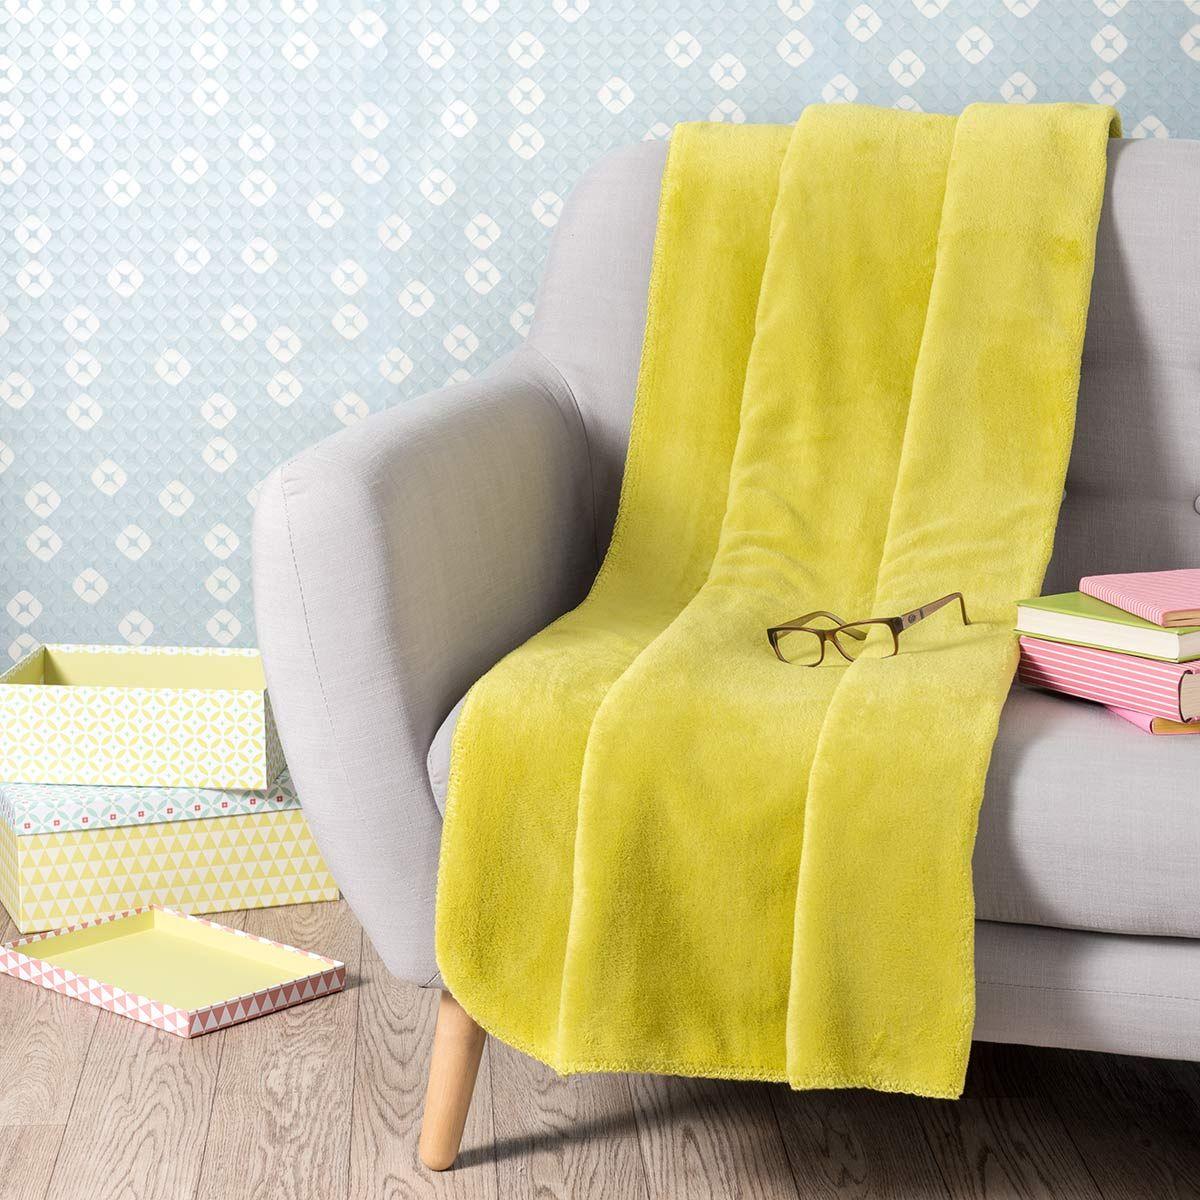 20 maisons du monde plaid en tissu jaune moutarde 150. Black Bedroom Furniture Sets. Home Design Ideas